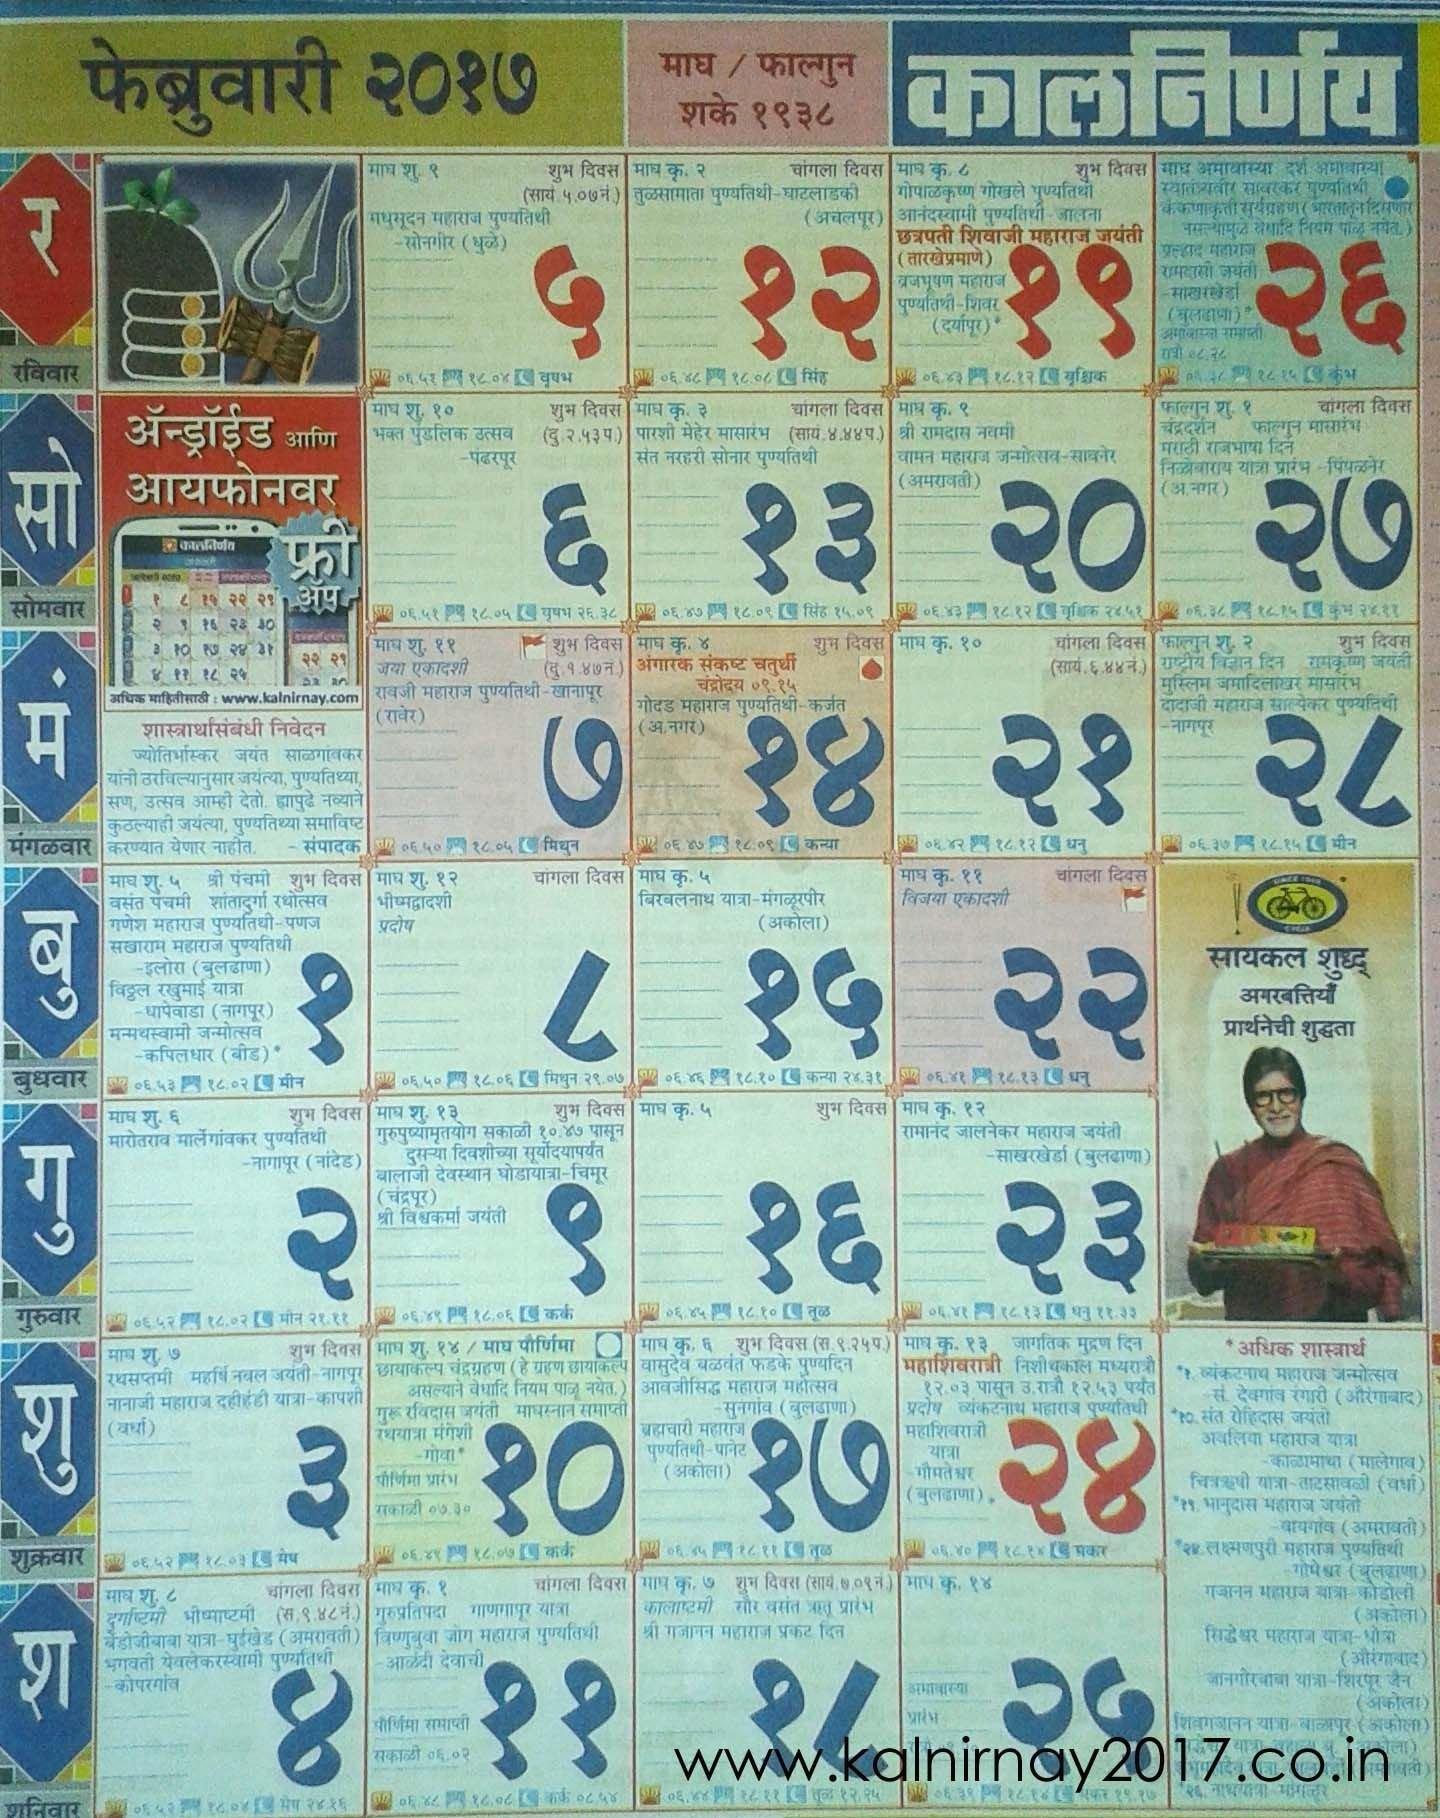 2021 Calendar Kalnirnay Marathi   Printable Calendars 2021 inside Kalnirnay 2021 Marathi Calendar